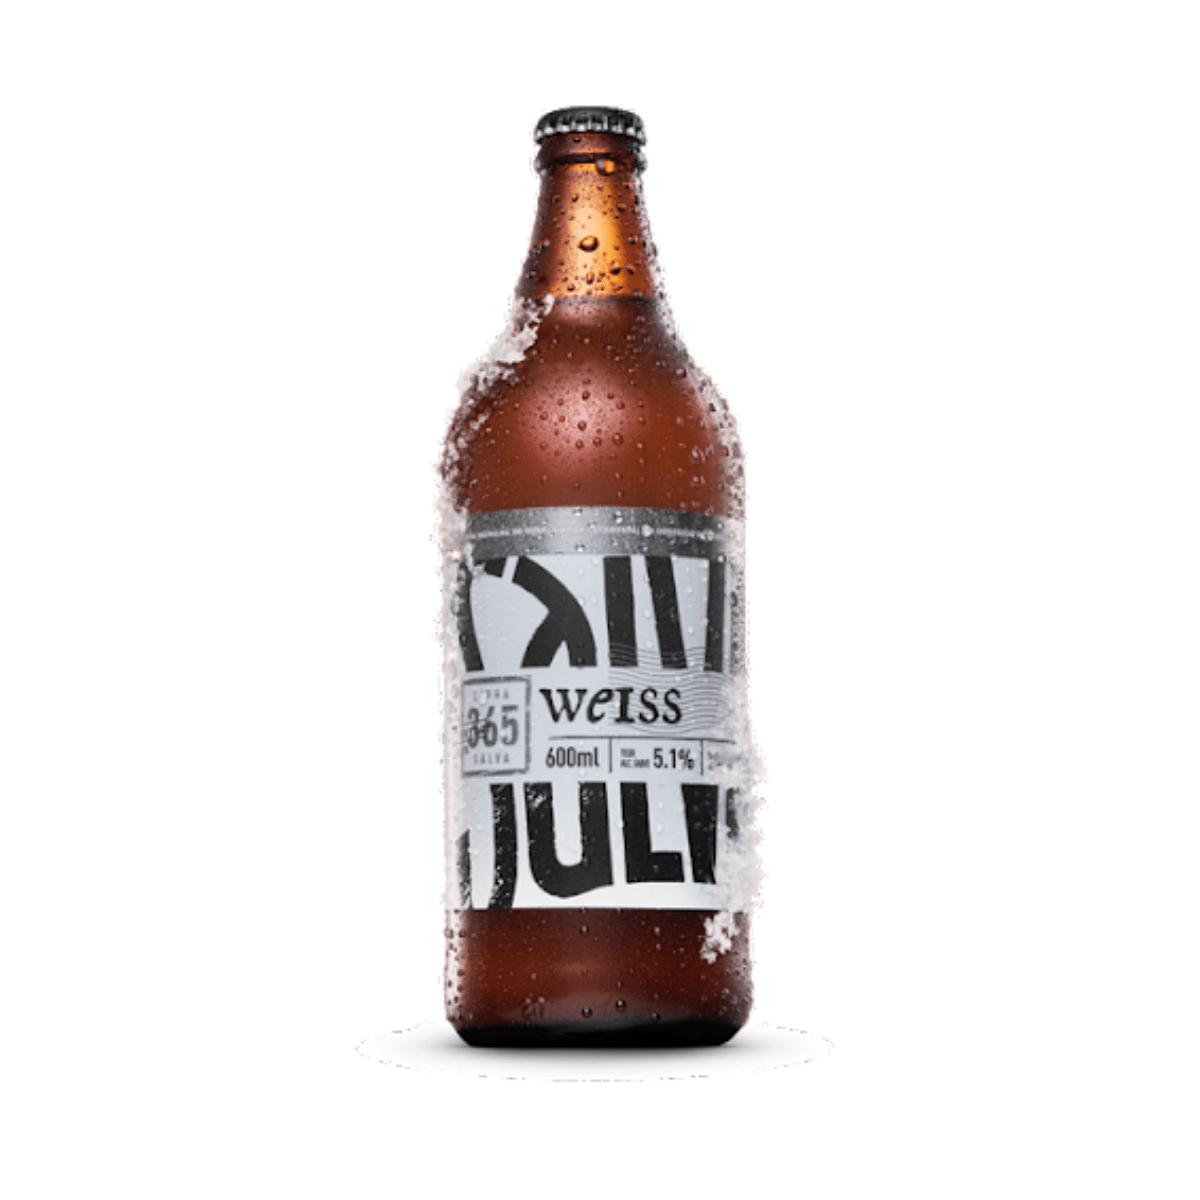 Cerveja Salva Weiss 600ml  - RS BEER - Cervejas Gaúchas